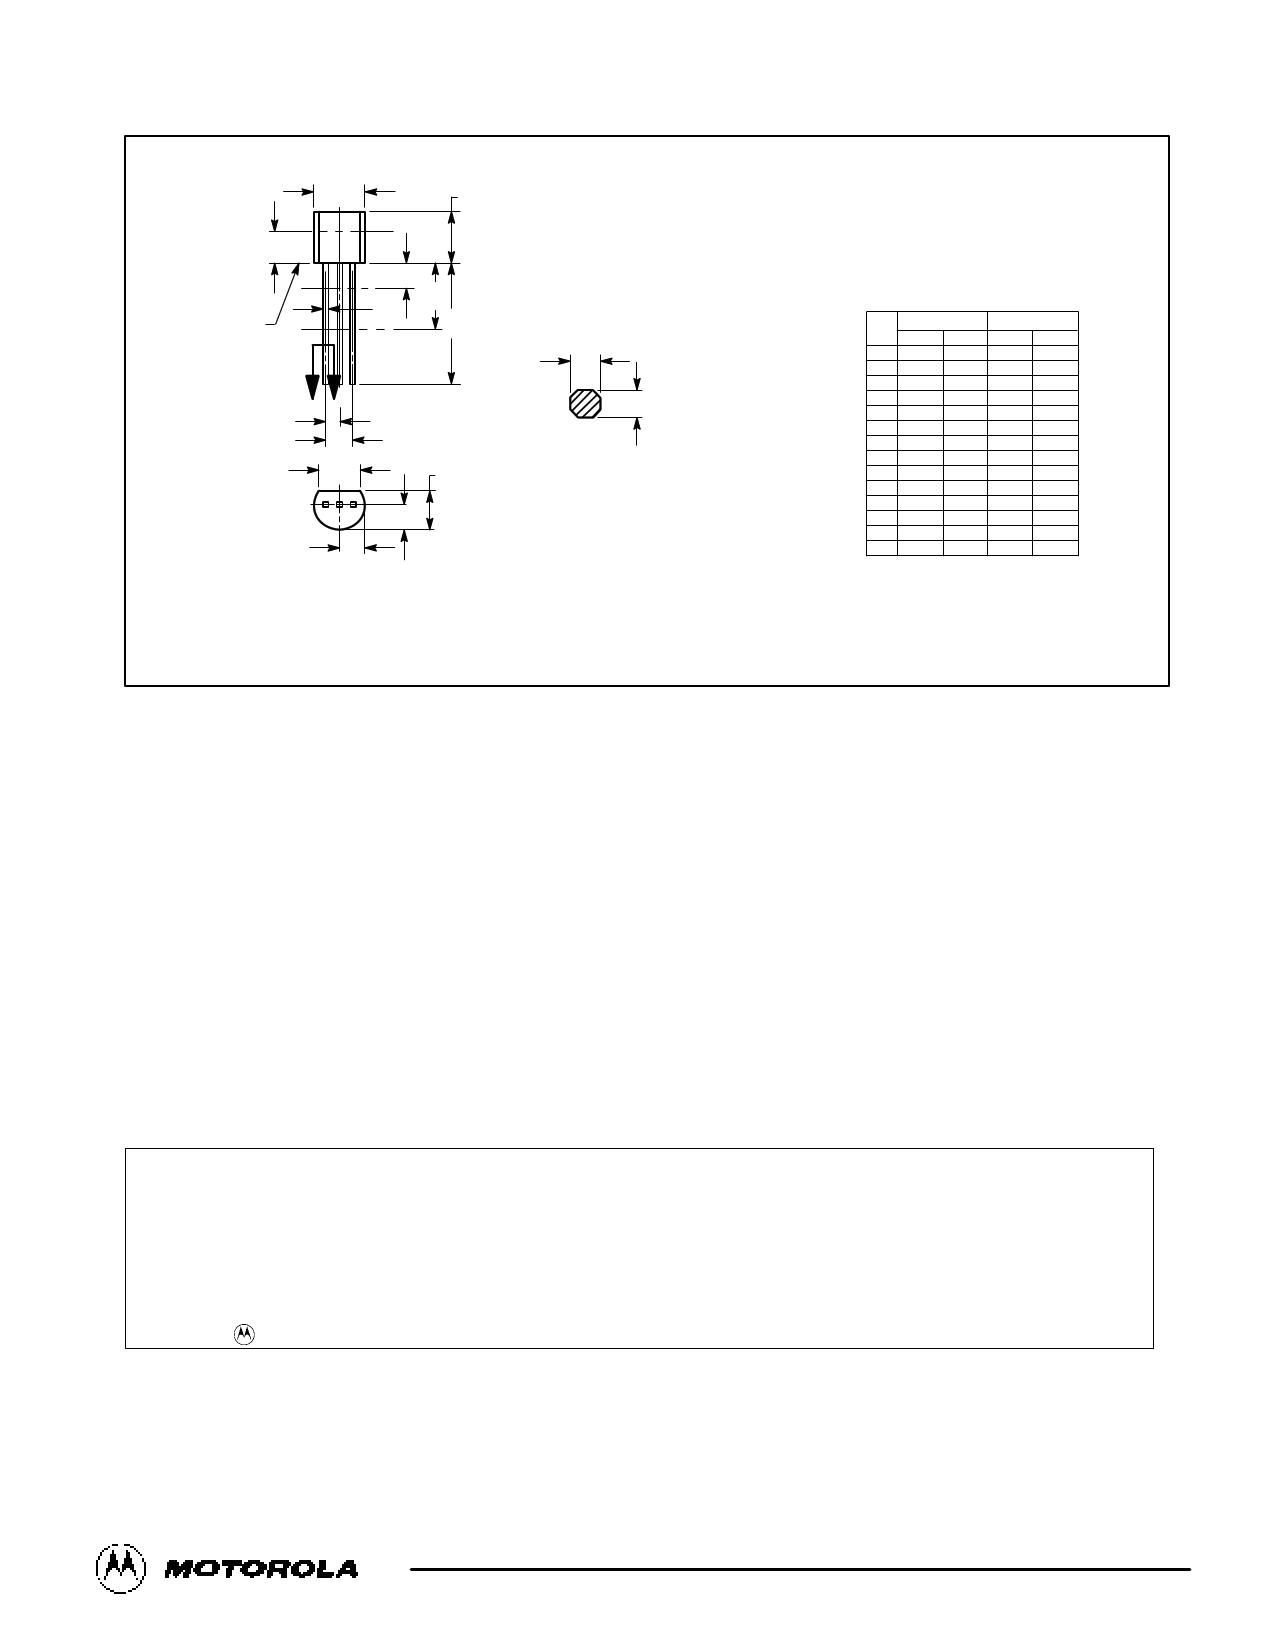 BC549 pdf, 반도체, 판매, 대치품